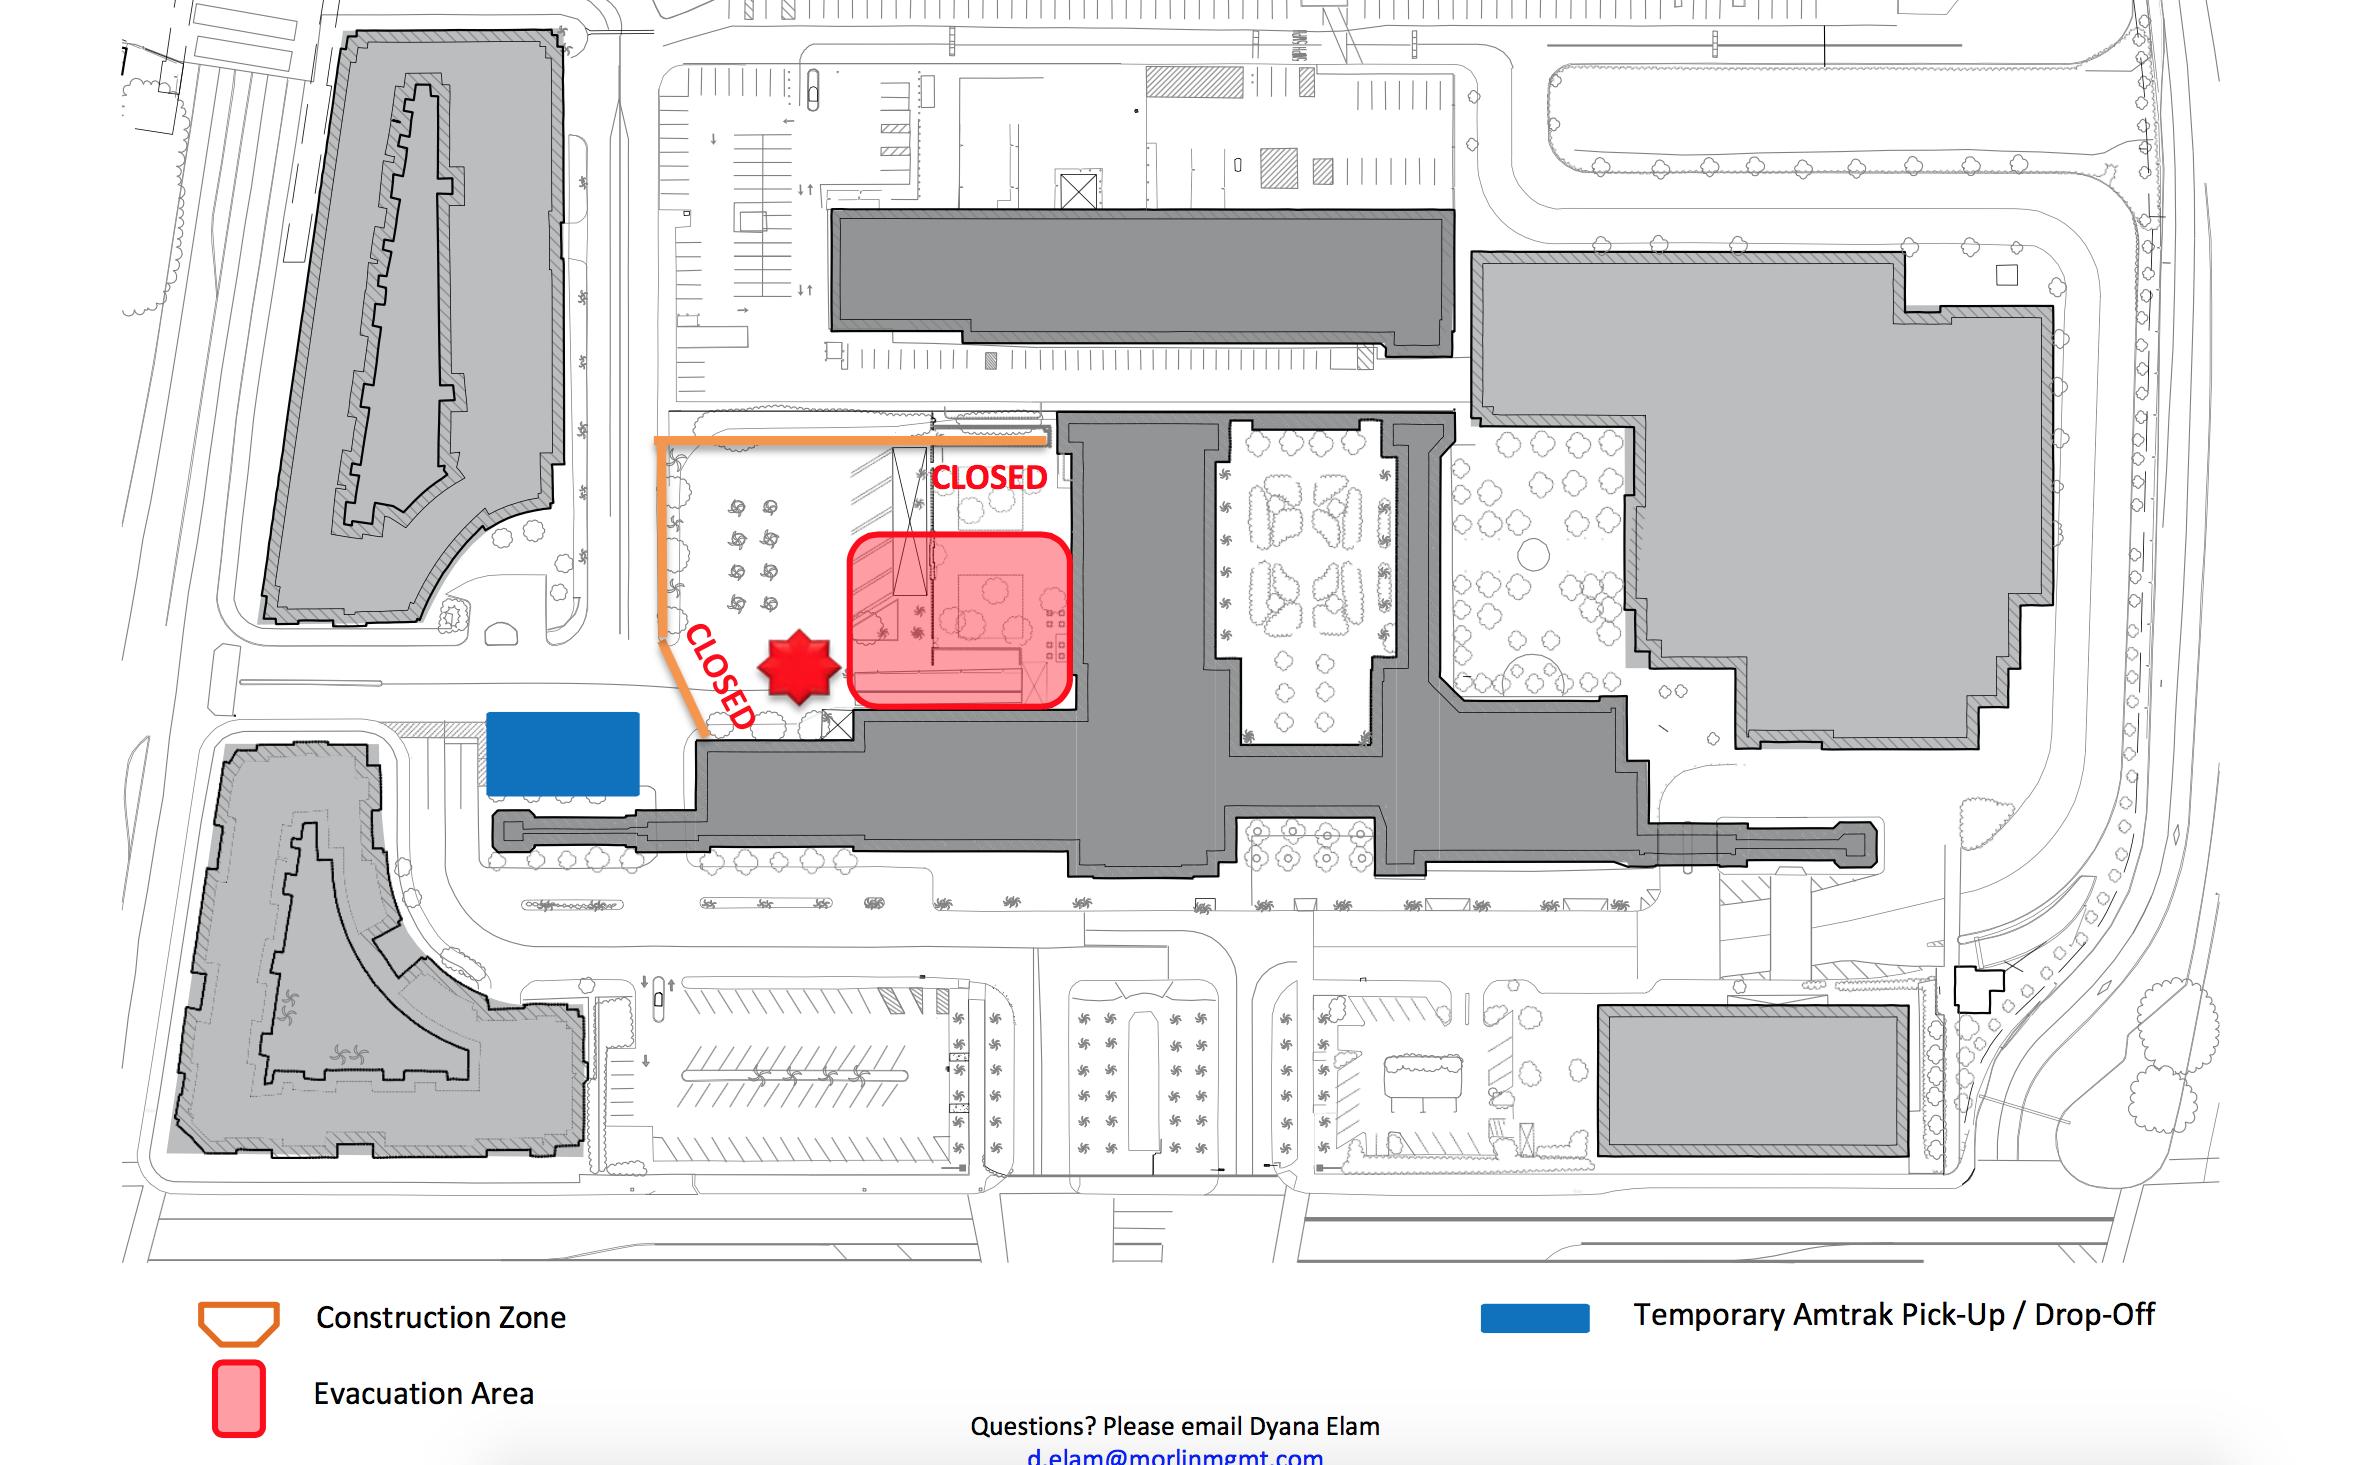 amtrak bus union station closure map